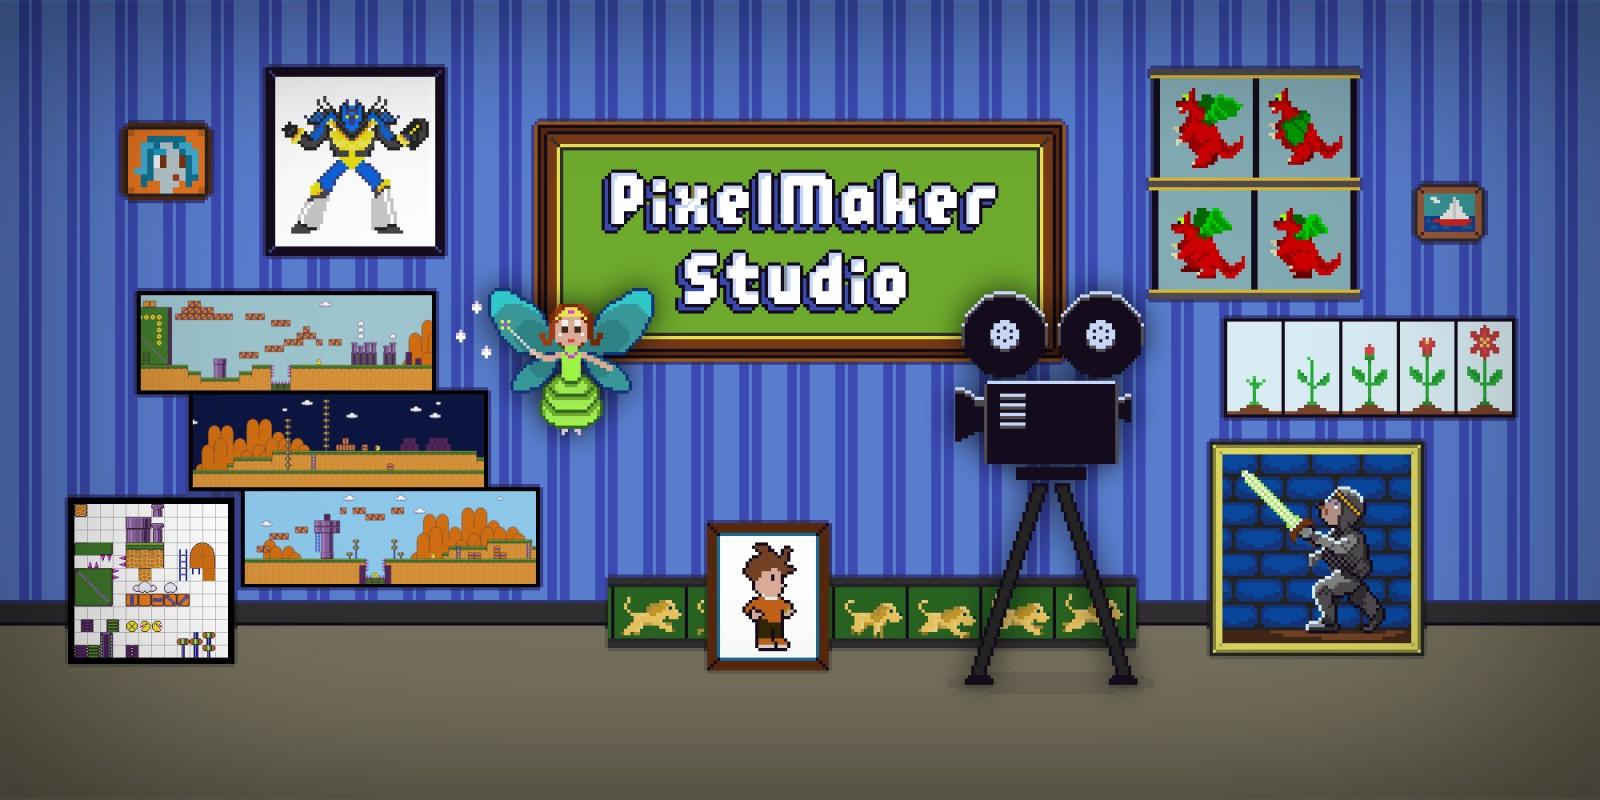 PixelMaker Studio coming to Wii U on March 21st, 2019